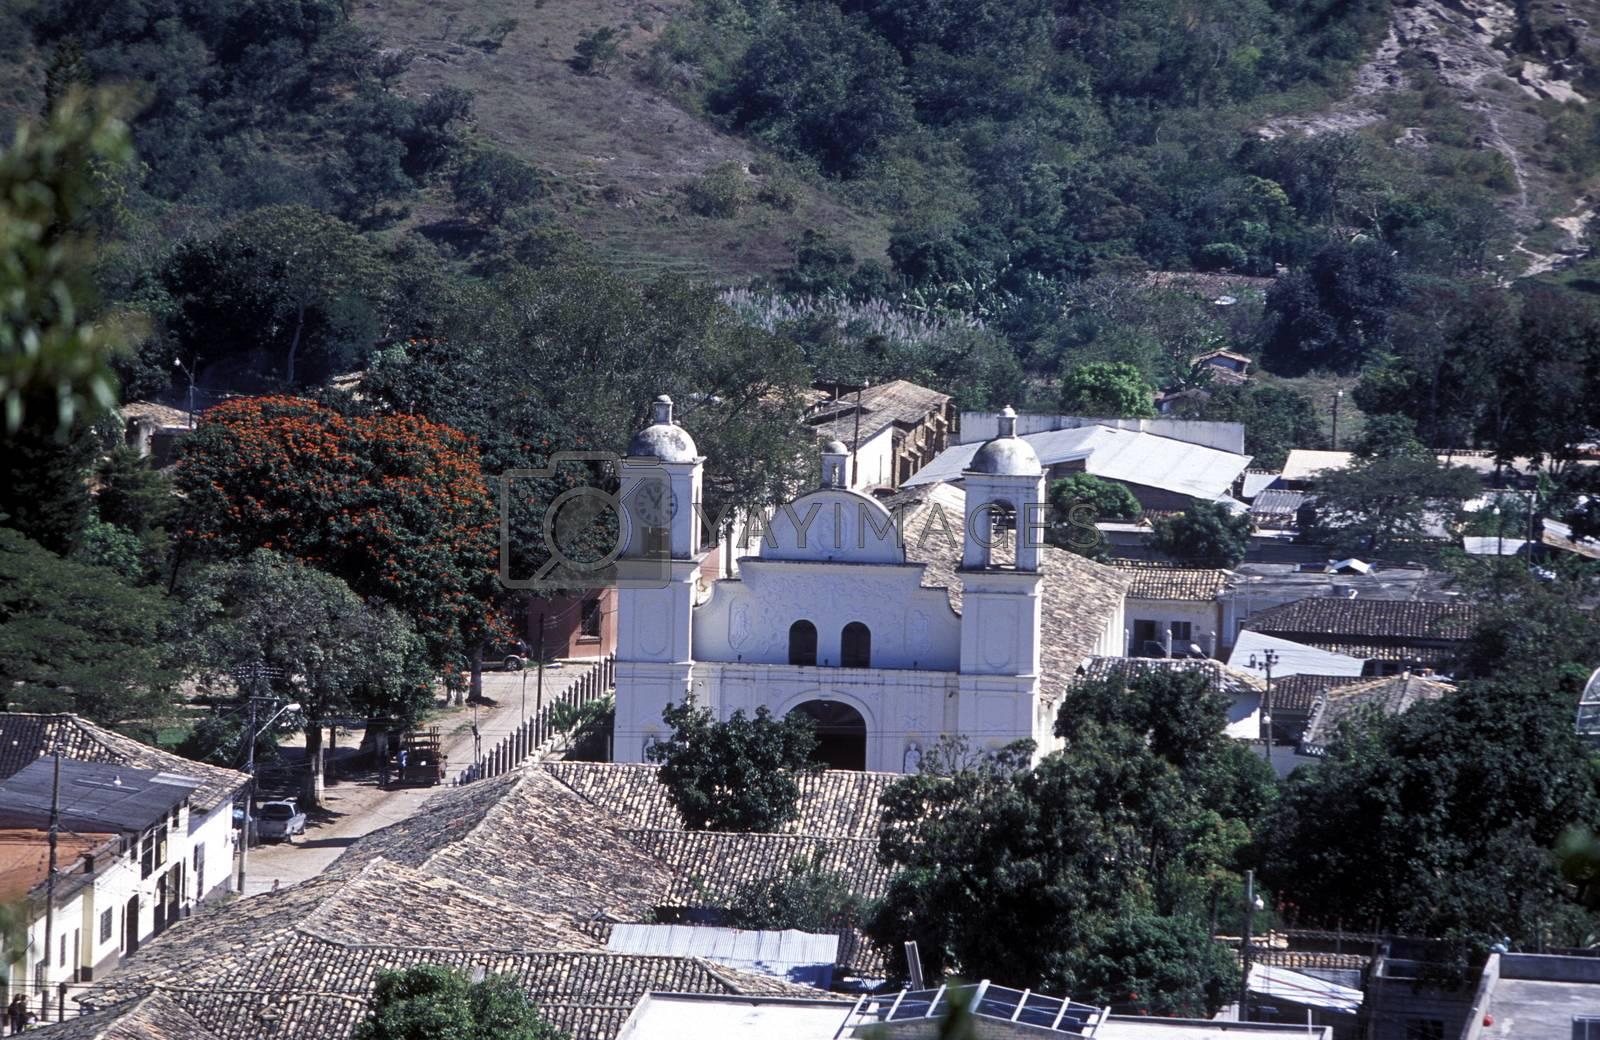 the Village of Gracias in Honduras in Central America,